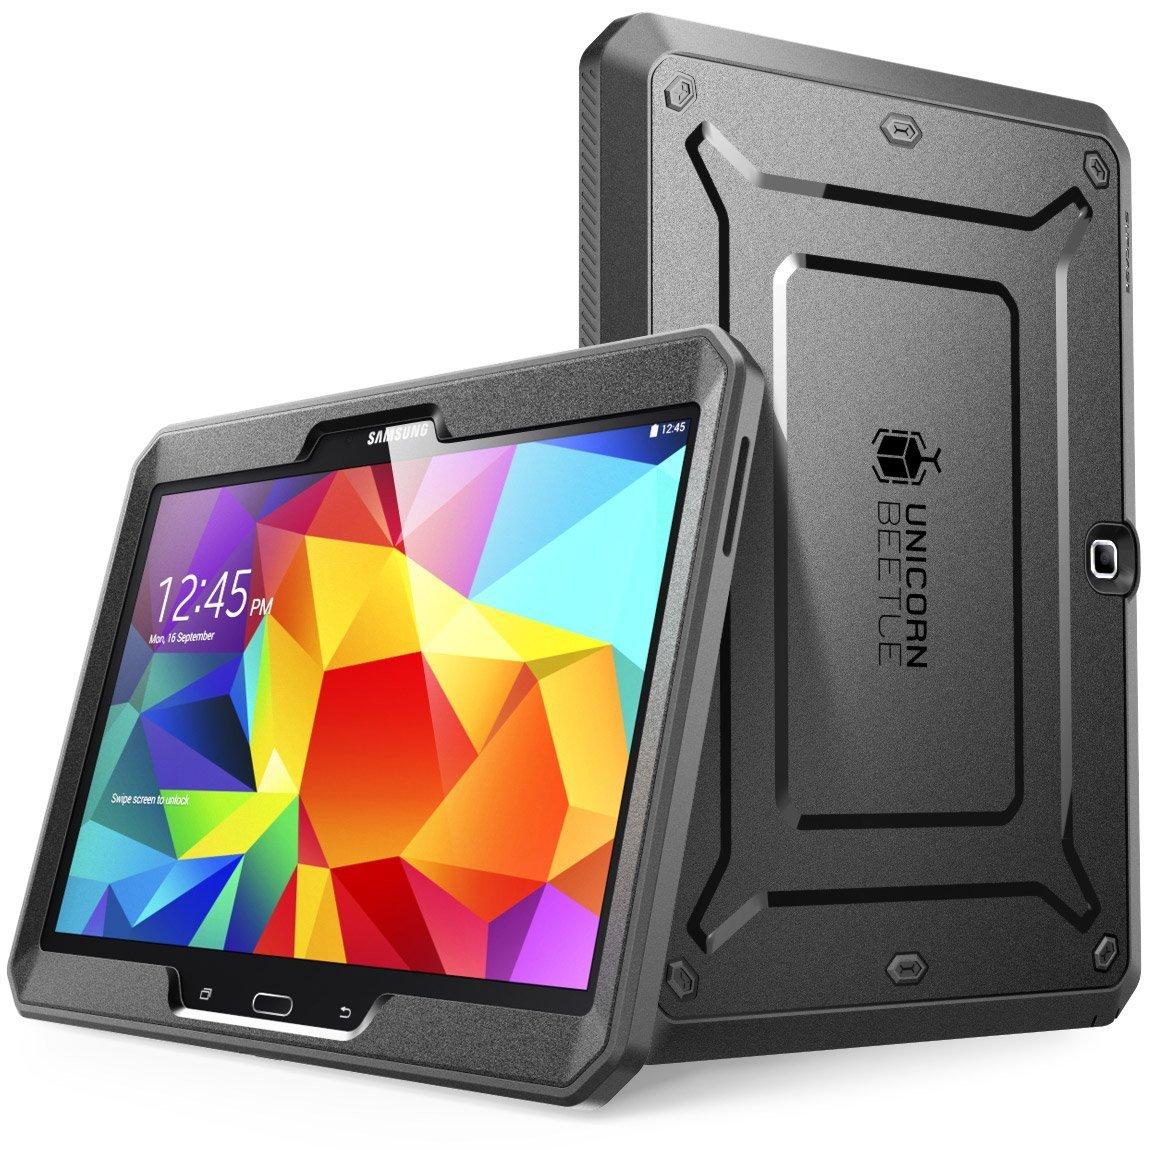 Samsung Galaxy Tab 4 10.1 Case, SUPCASE,Case for Galaxy Tab 4 10.1 Tablet Unicorn Beetle Pro Series Full-body Case-Black